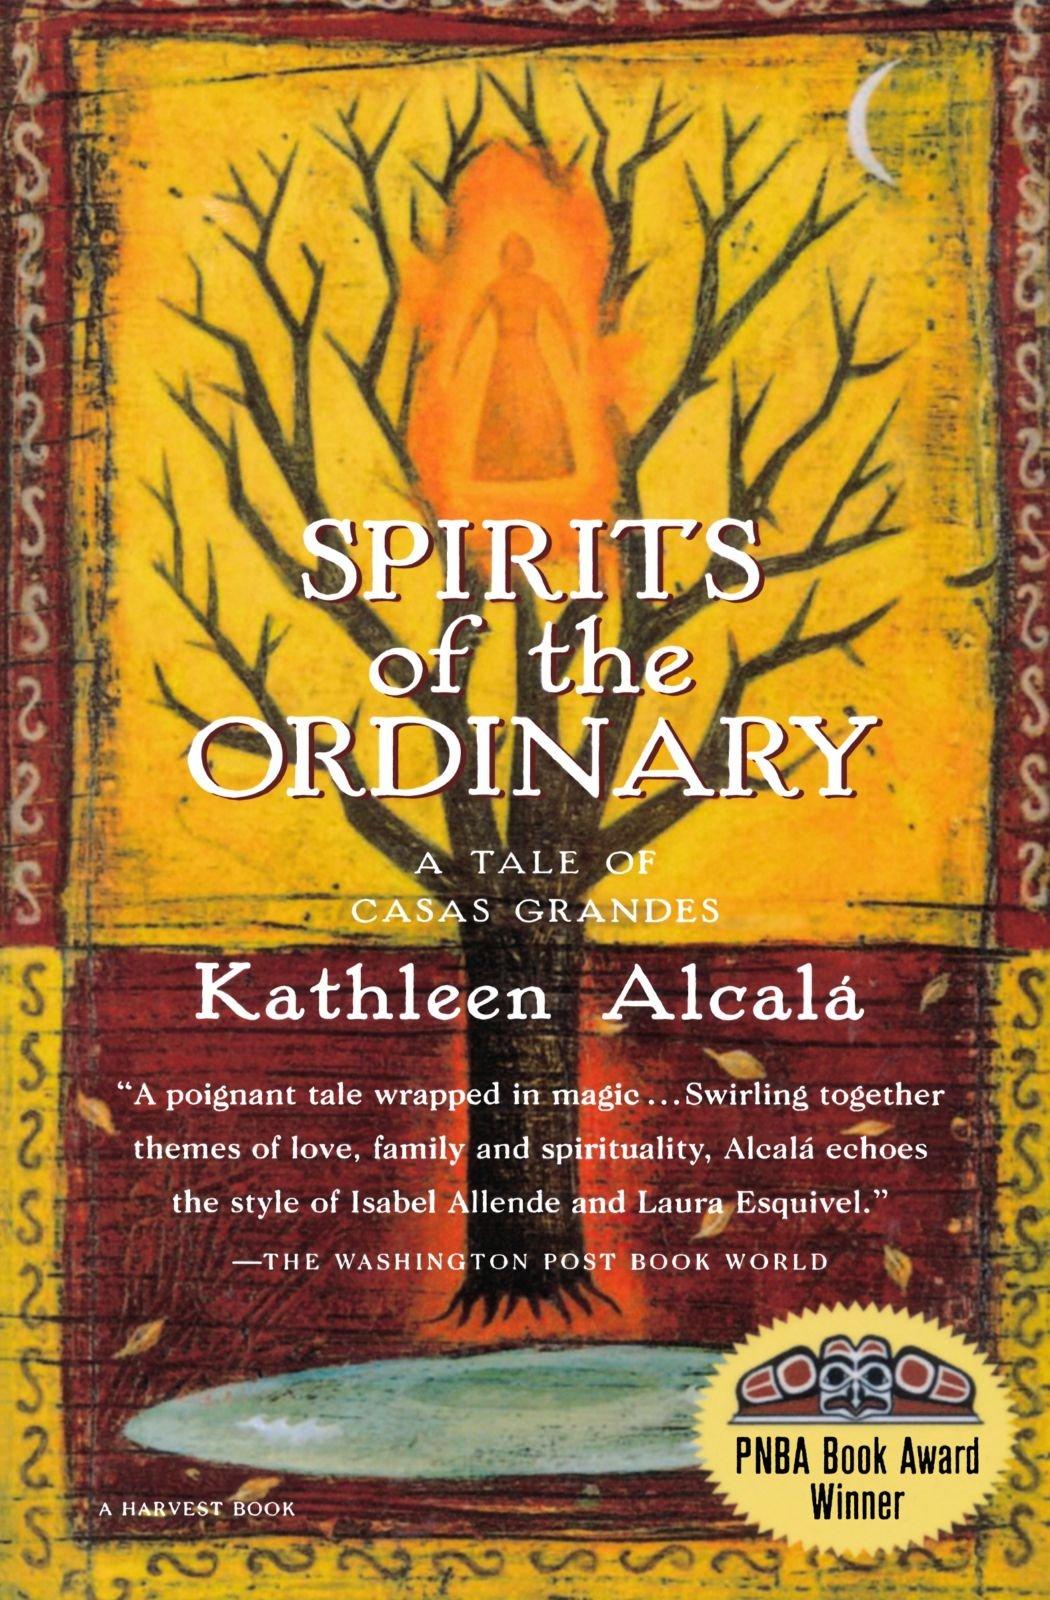 Spirits of the Ordinary